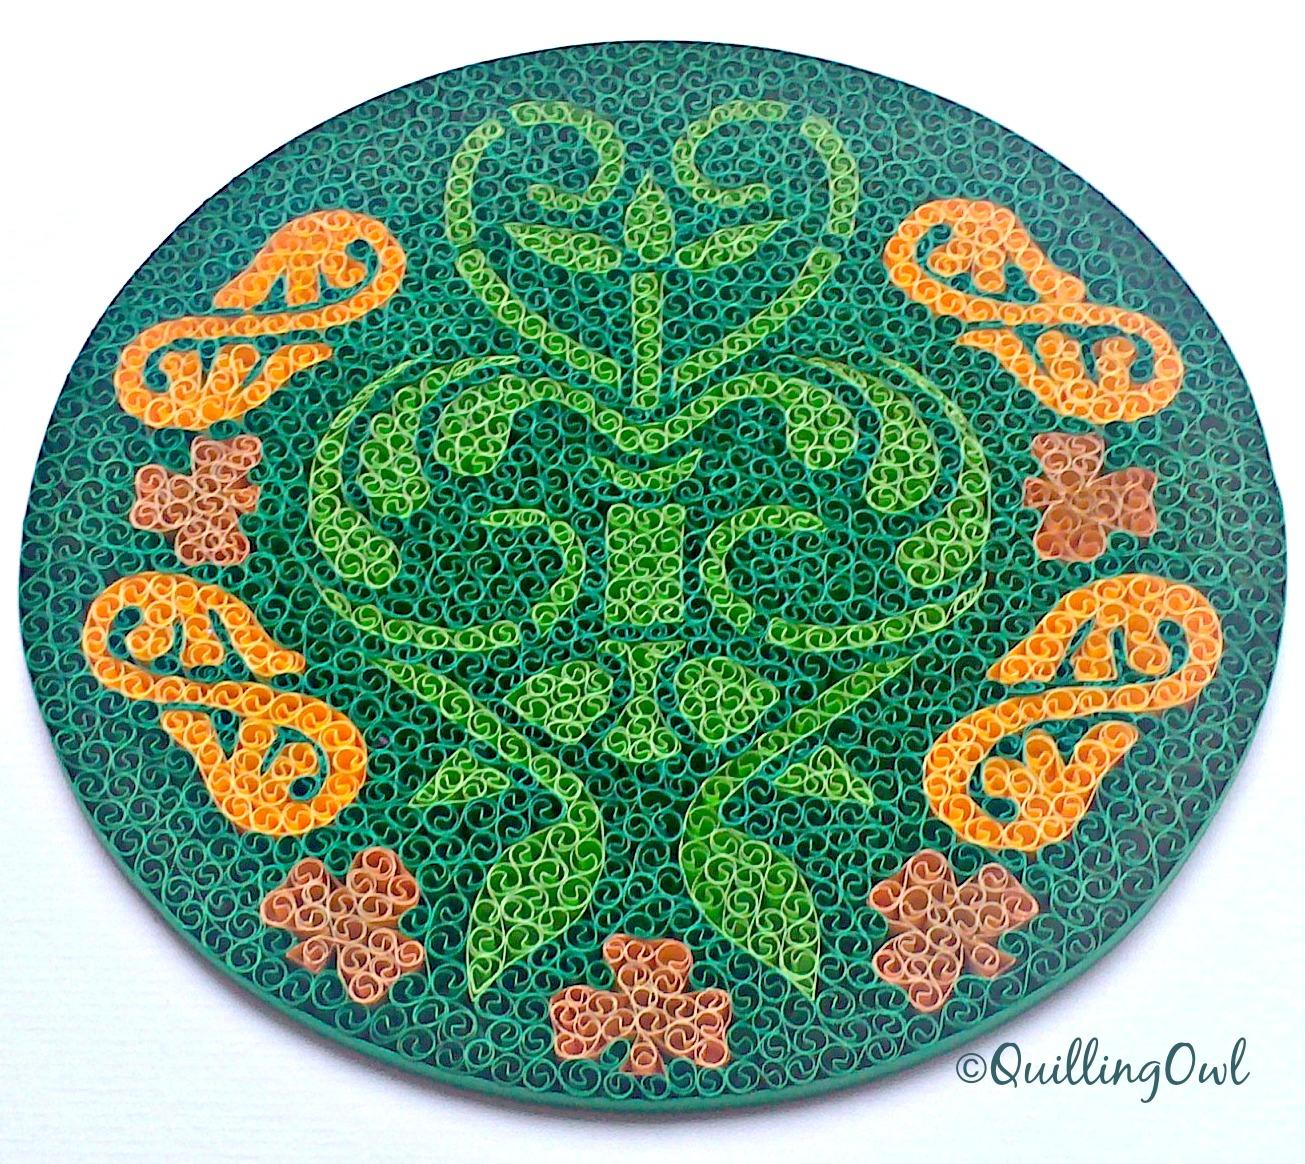 Celtic Love, paper quilling